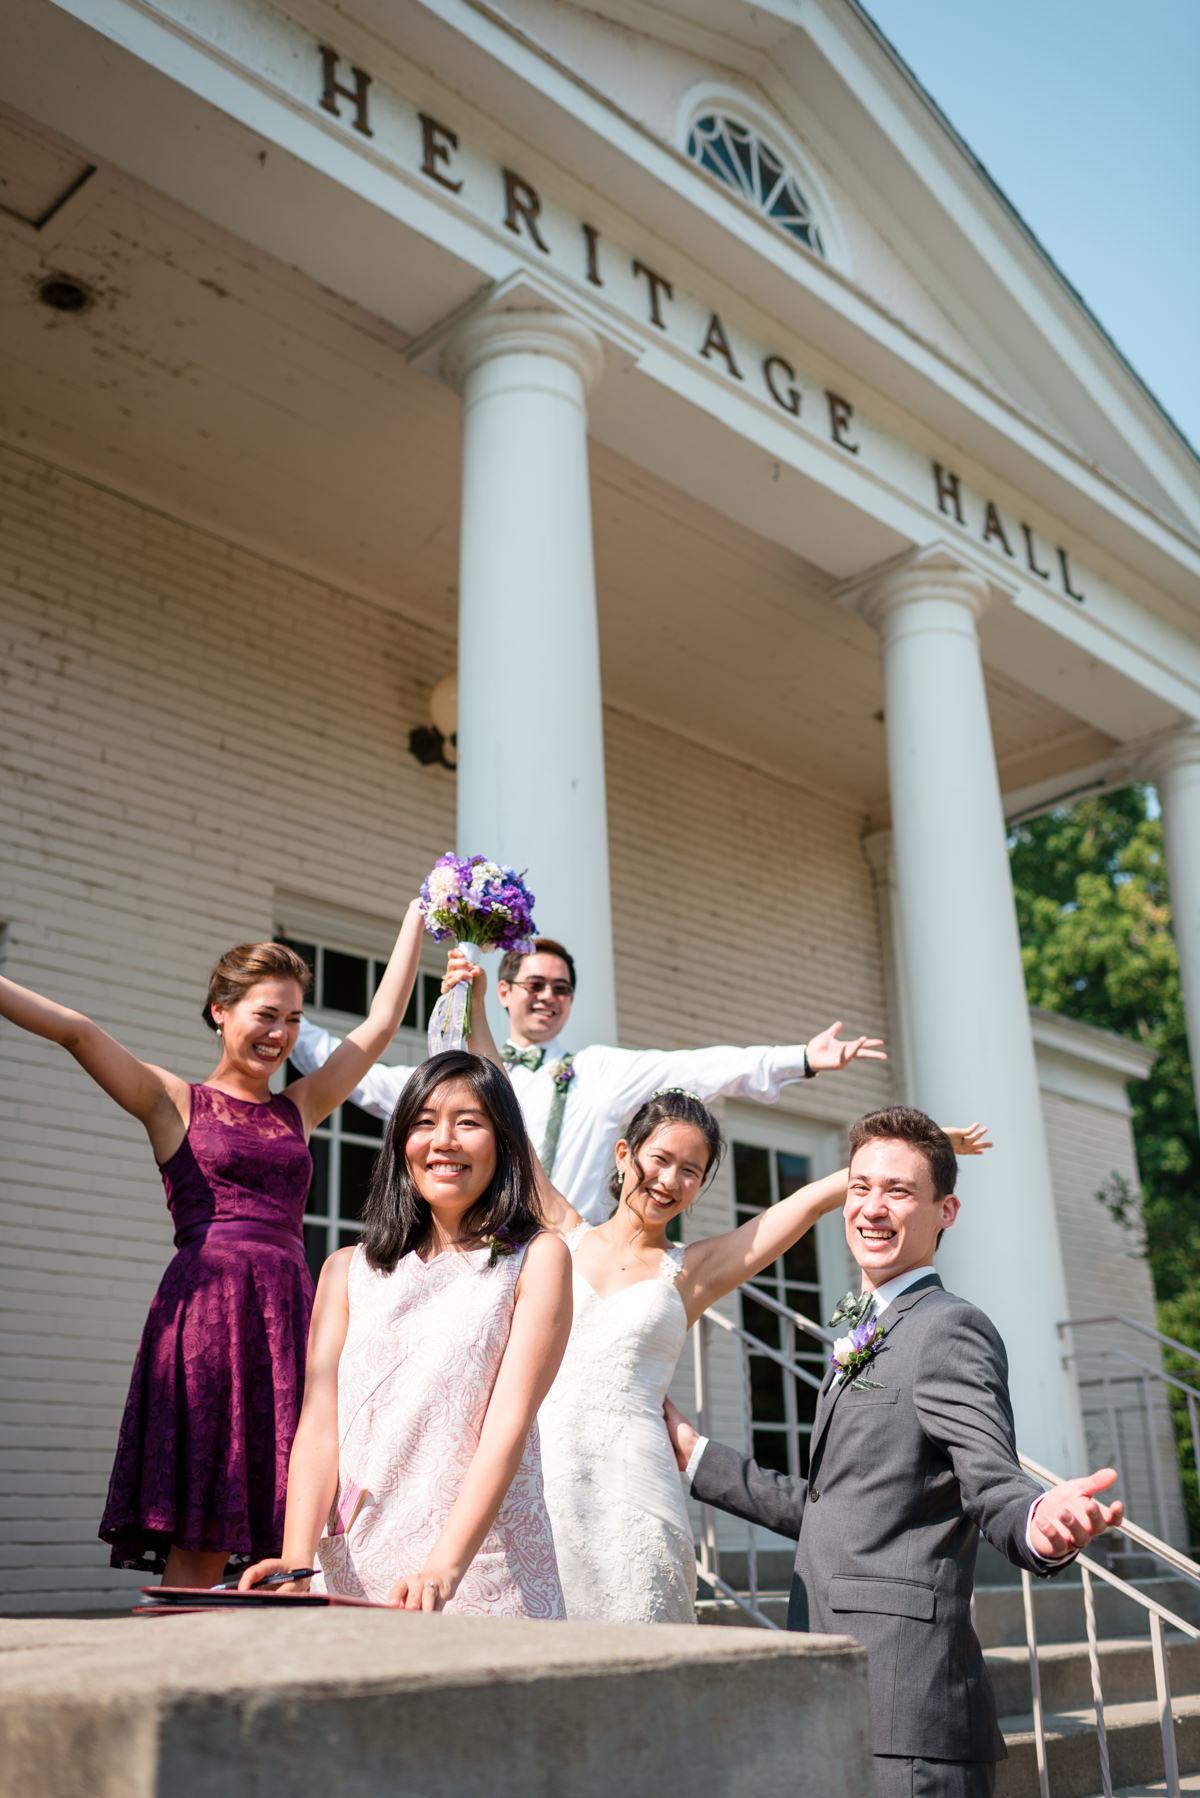 Andrew Tat - Documentary Wedding Photography - Heritage Hall - Kirkland, Washington - Grace & James - 59.JPG